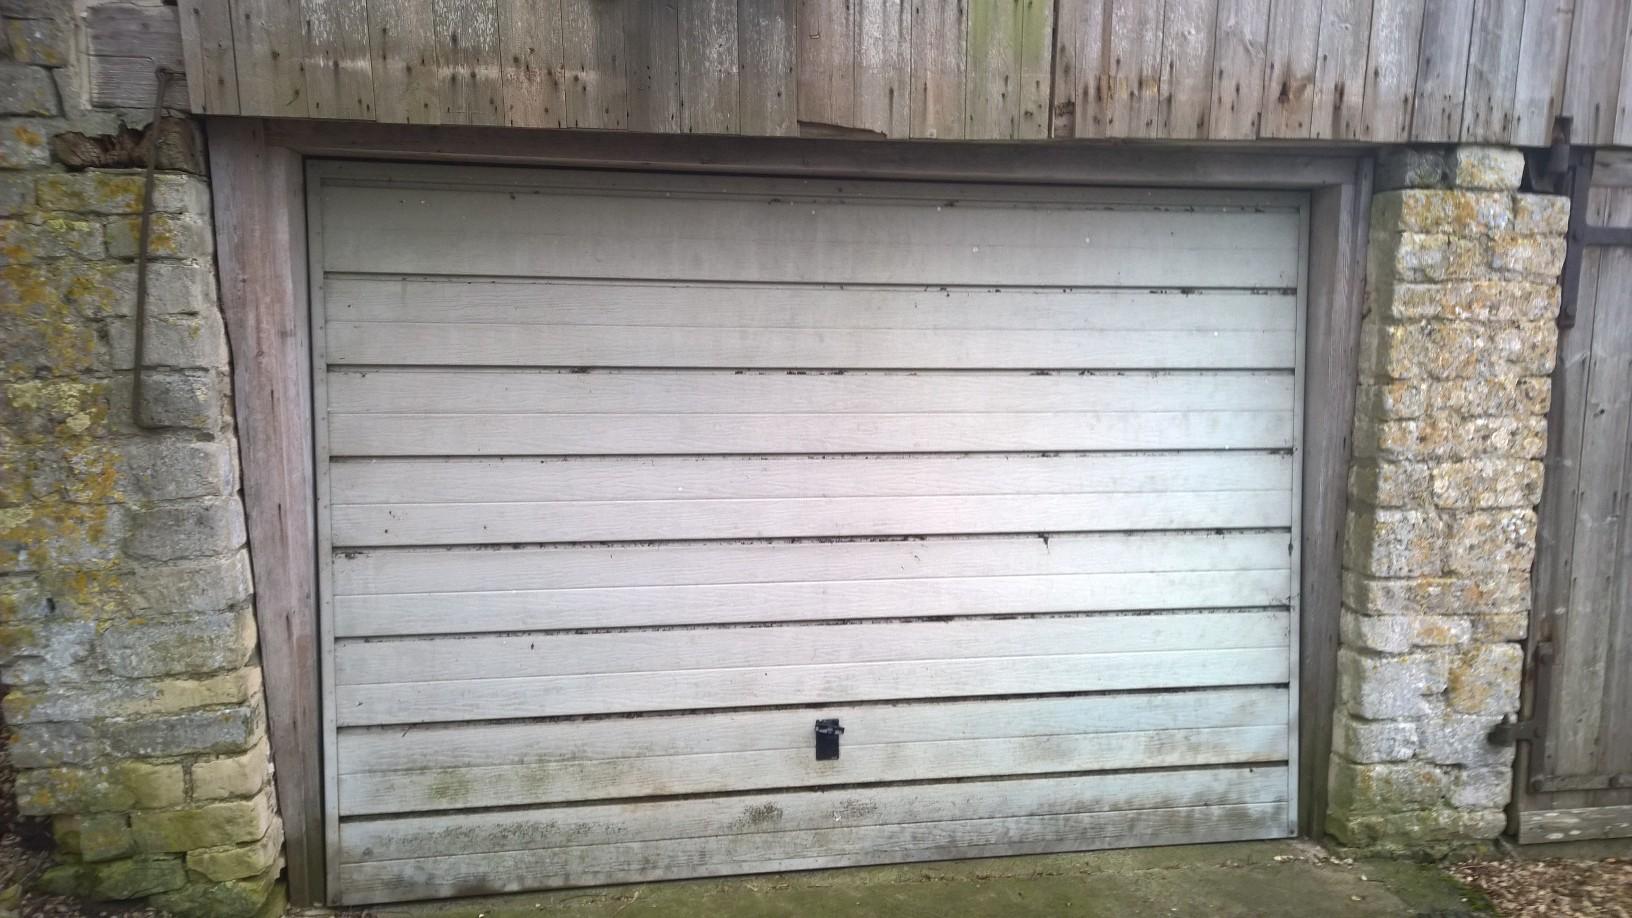 cardale novoferm steel georgian garage door in dusty grey. Black Bedroom Furniture Sets. Home Design Ideas